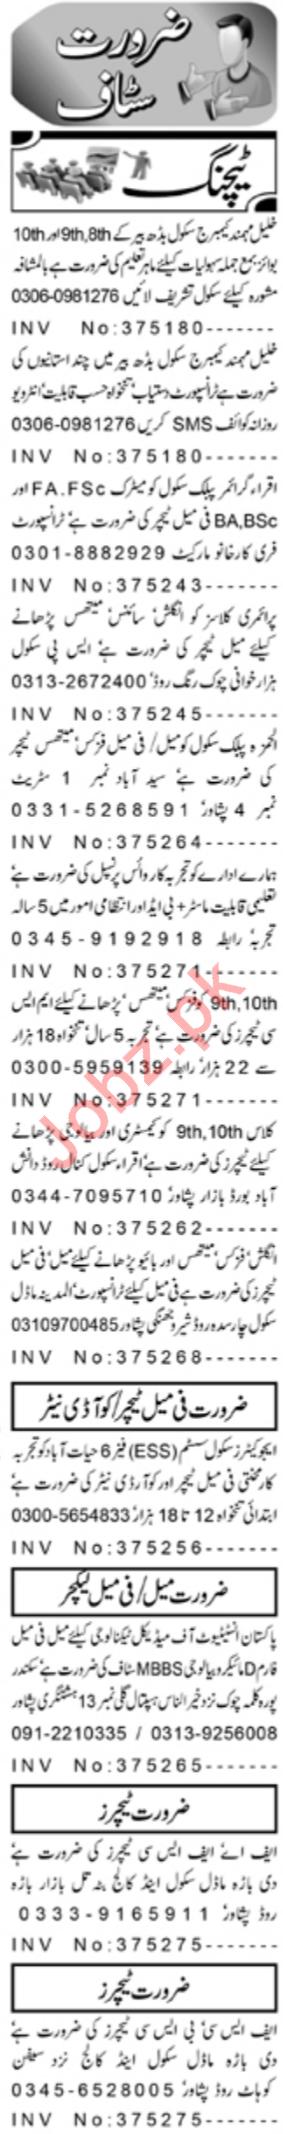 Daily Aaj Teaching Staff Jobs 2020 in Peshawar